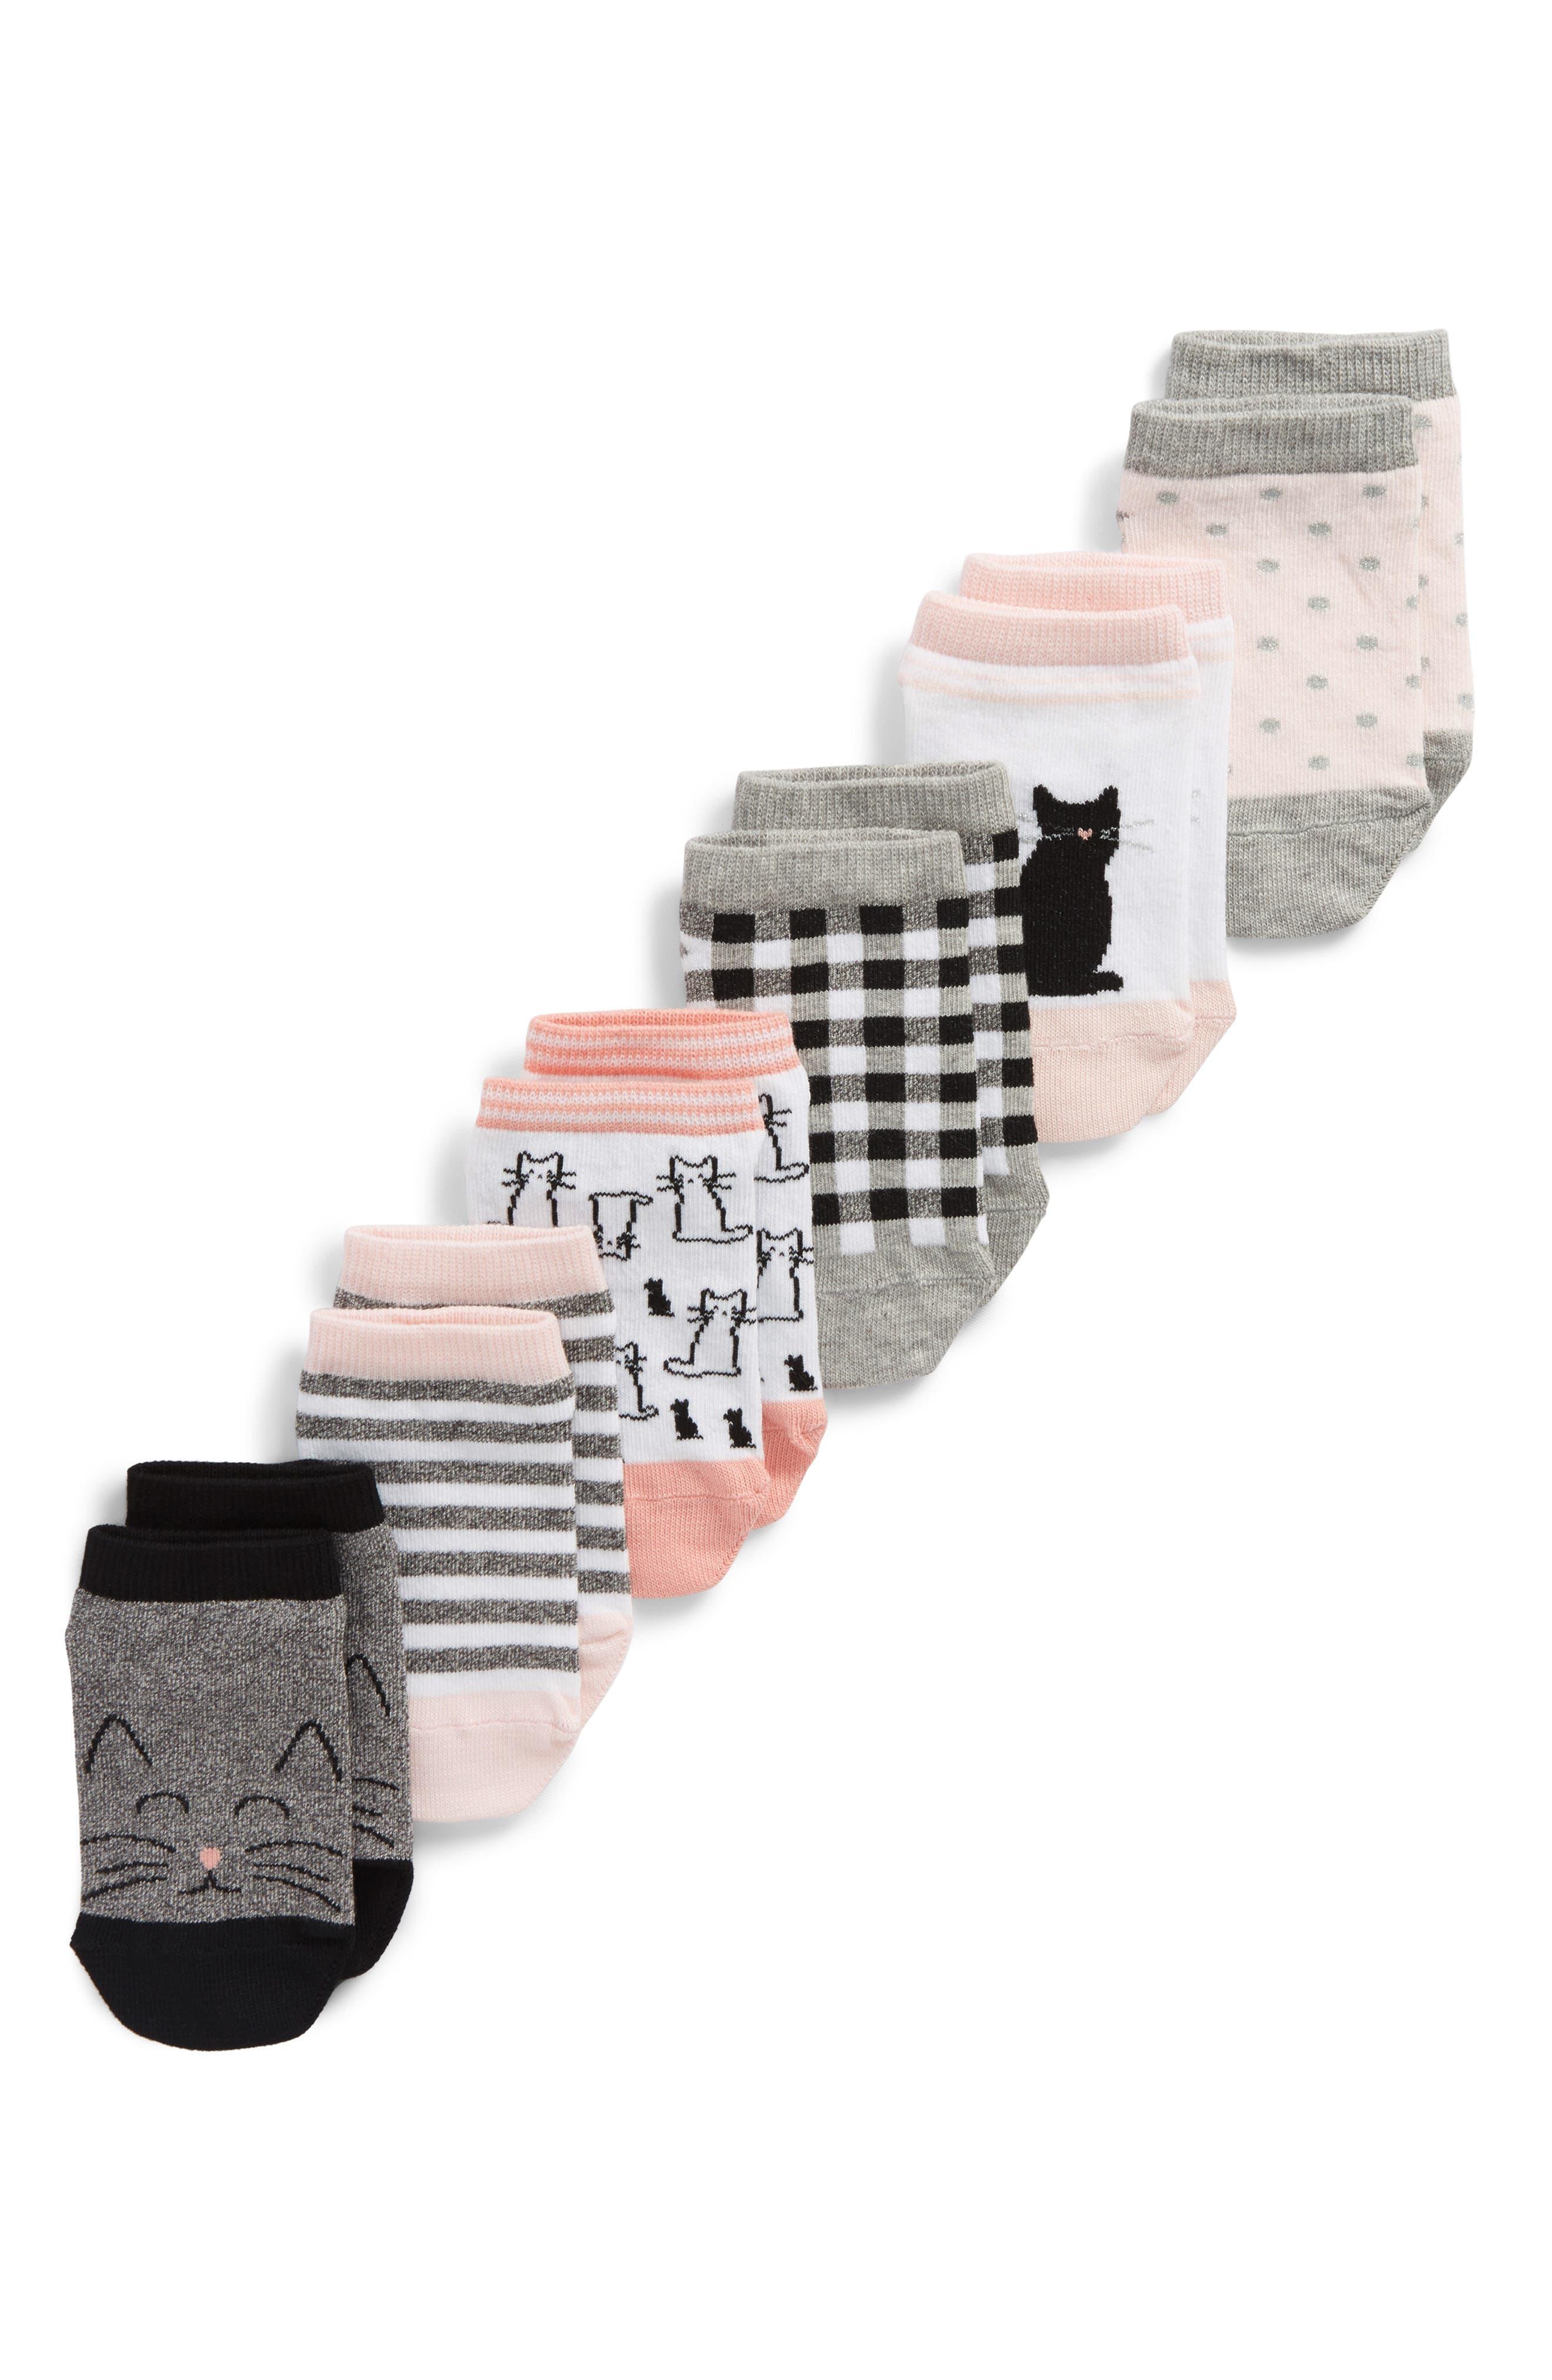 6-Pack Assorted Low Cut Socks,                             Main thumbnail 1, color,                             Black Multi